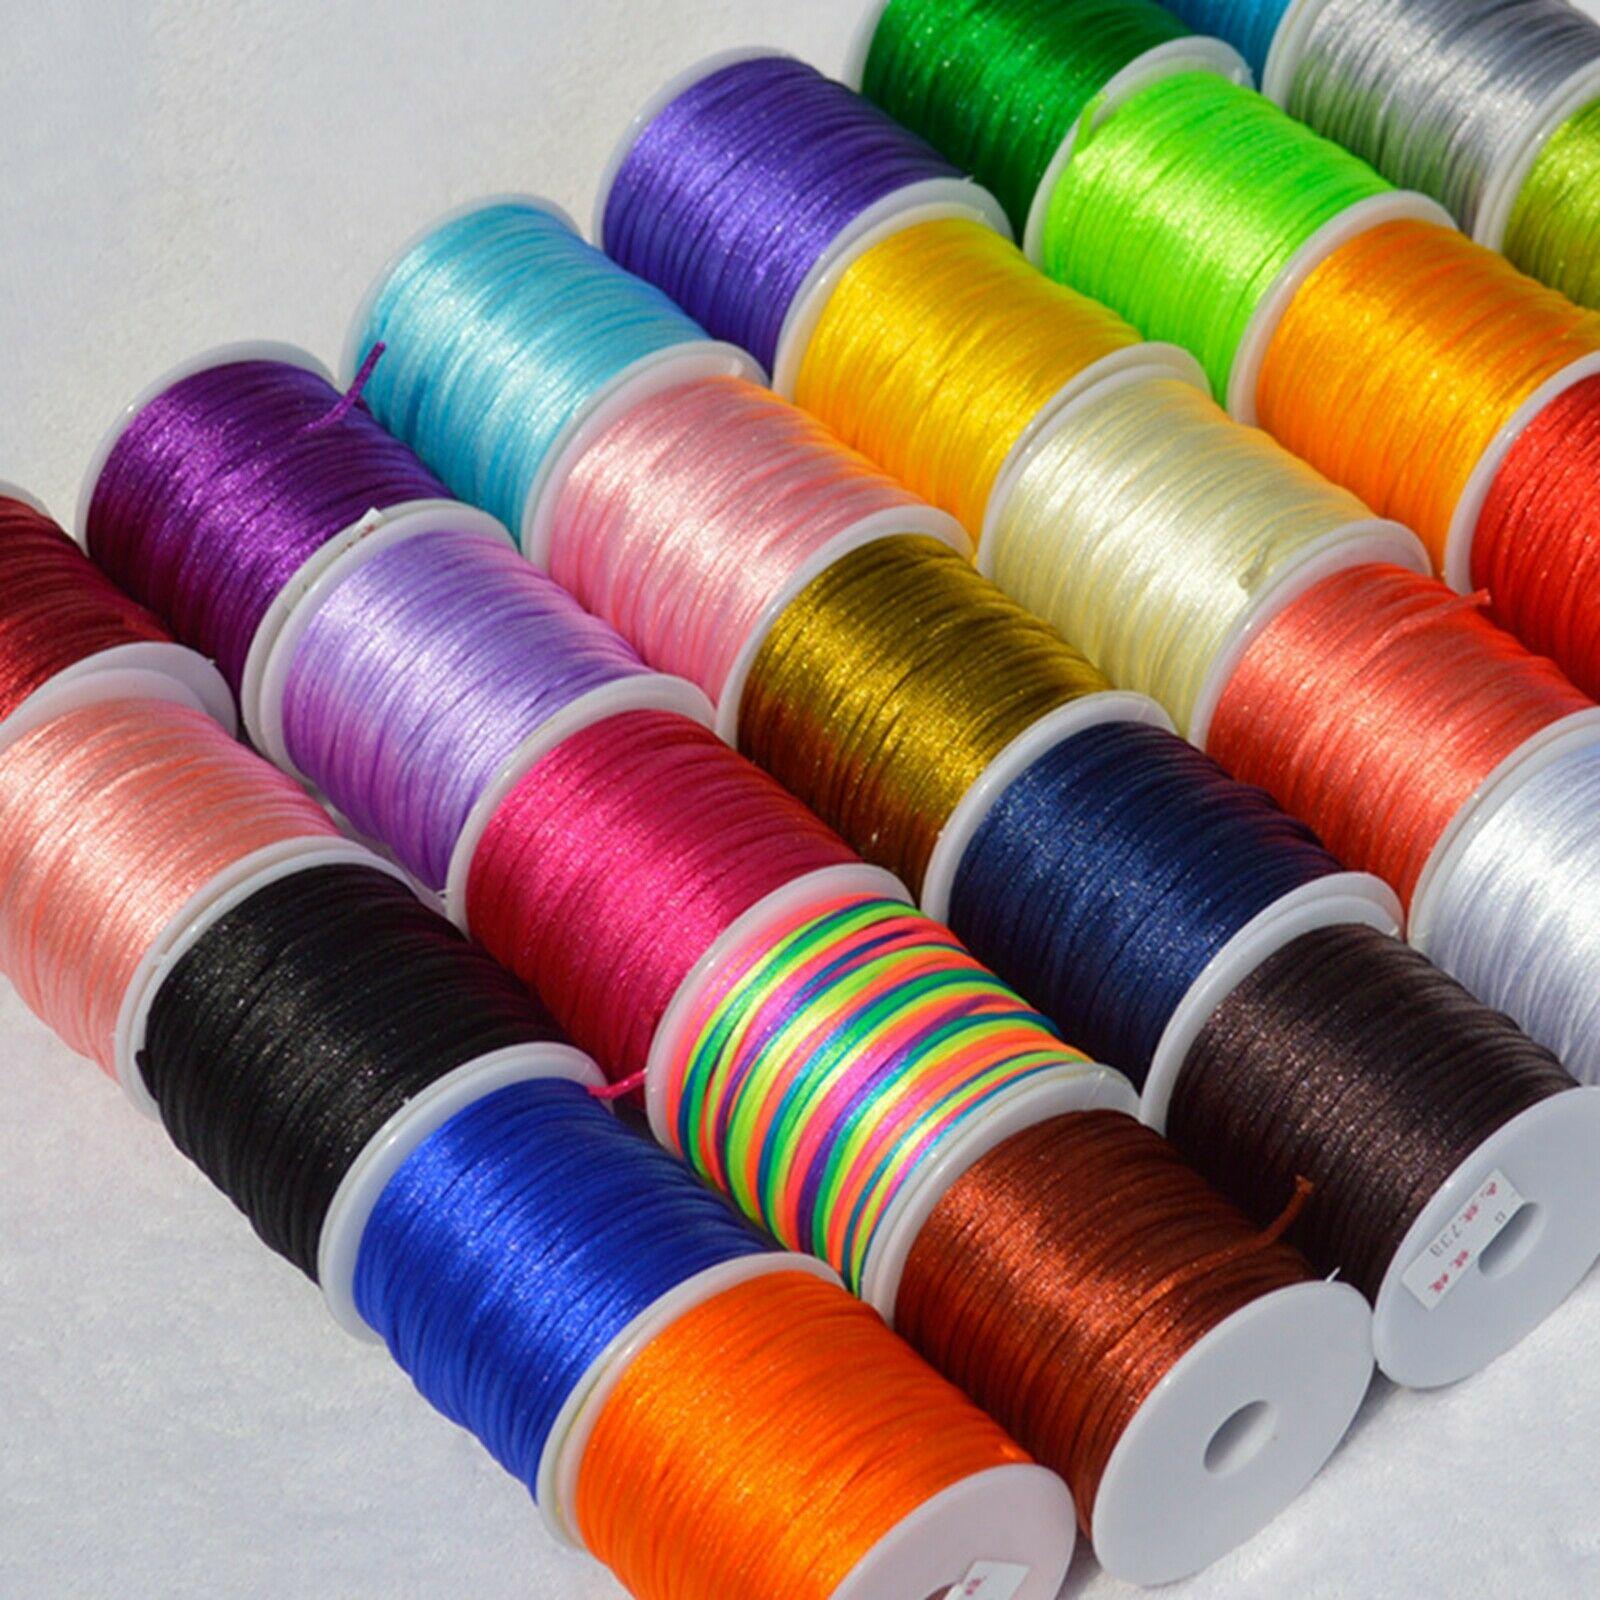 40 medidores de seda de cetim chinês cabo nó 2mm rattail fio colar carretel